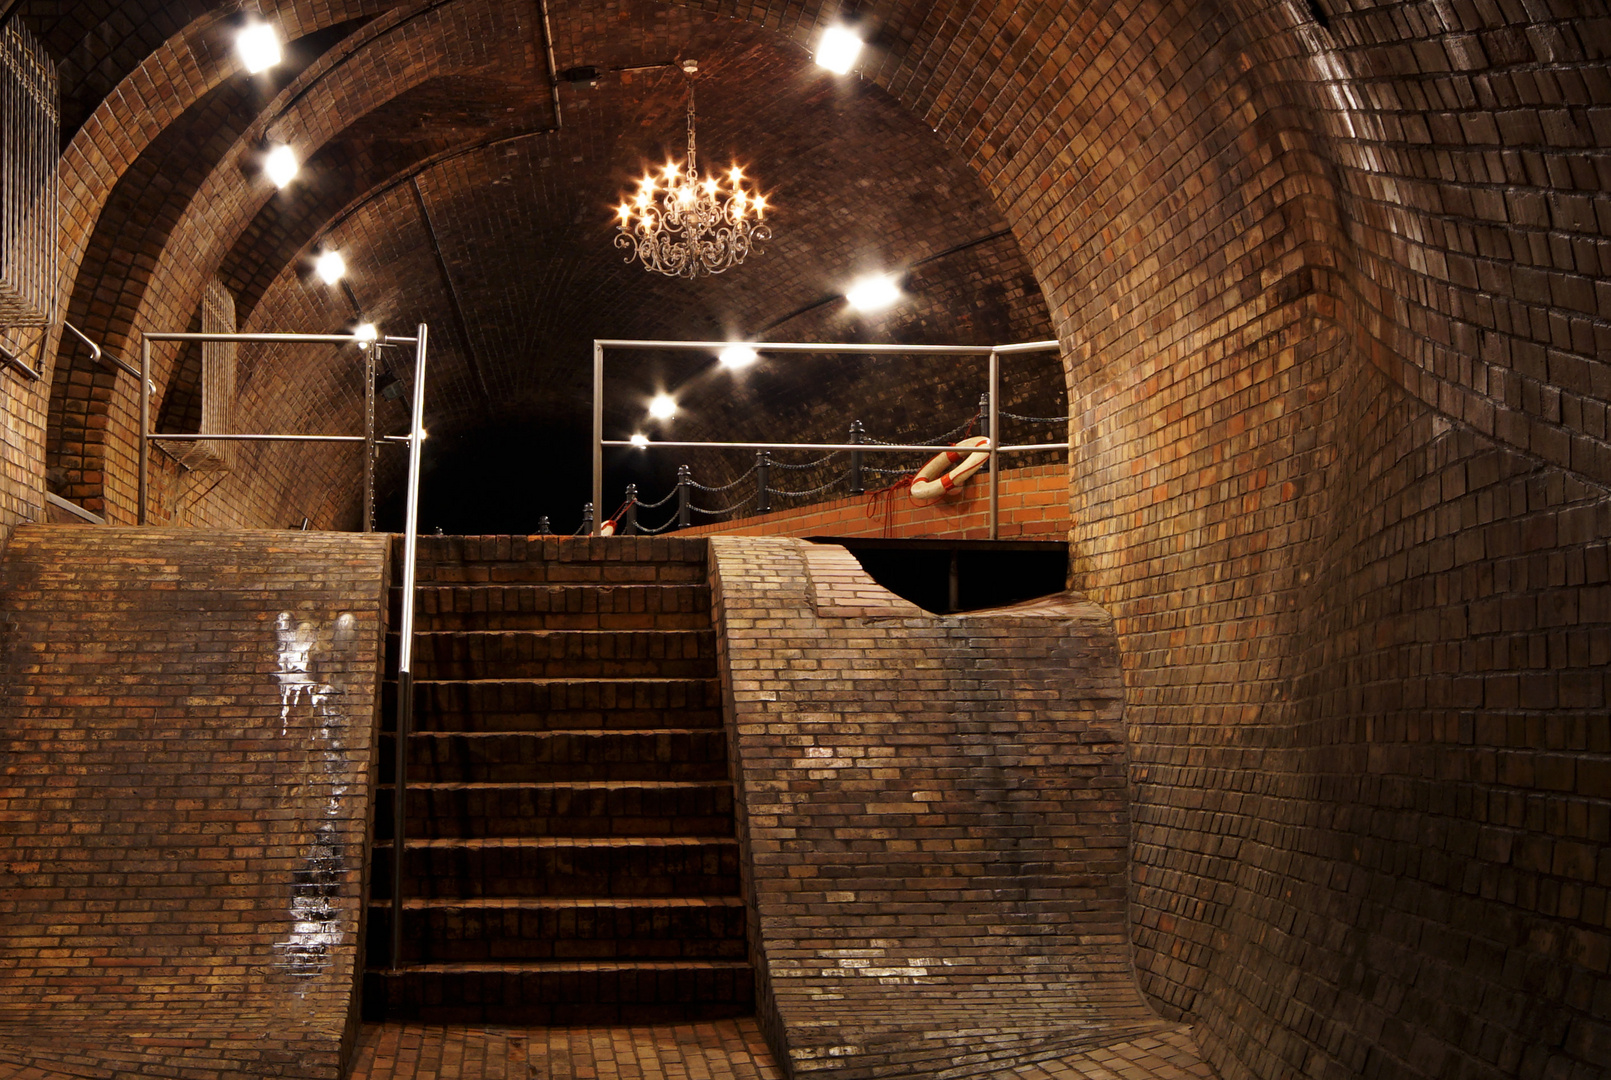 Kronleuchter Treppe ~ Kronleuchtersaal treppe foto & bild architektur stadtlandschaft